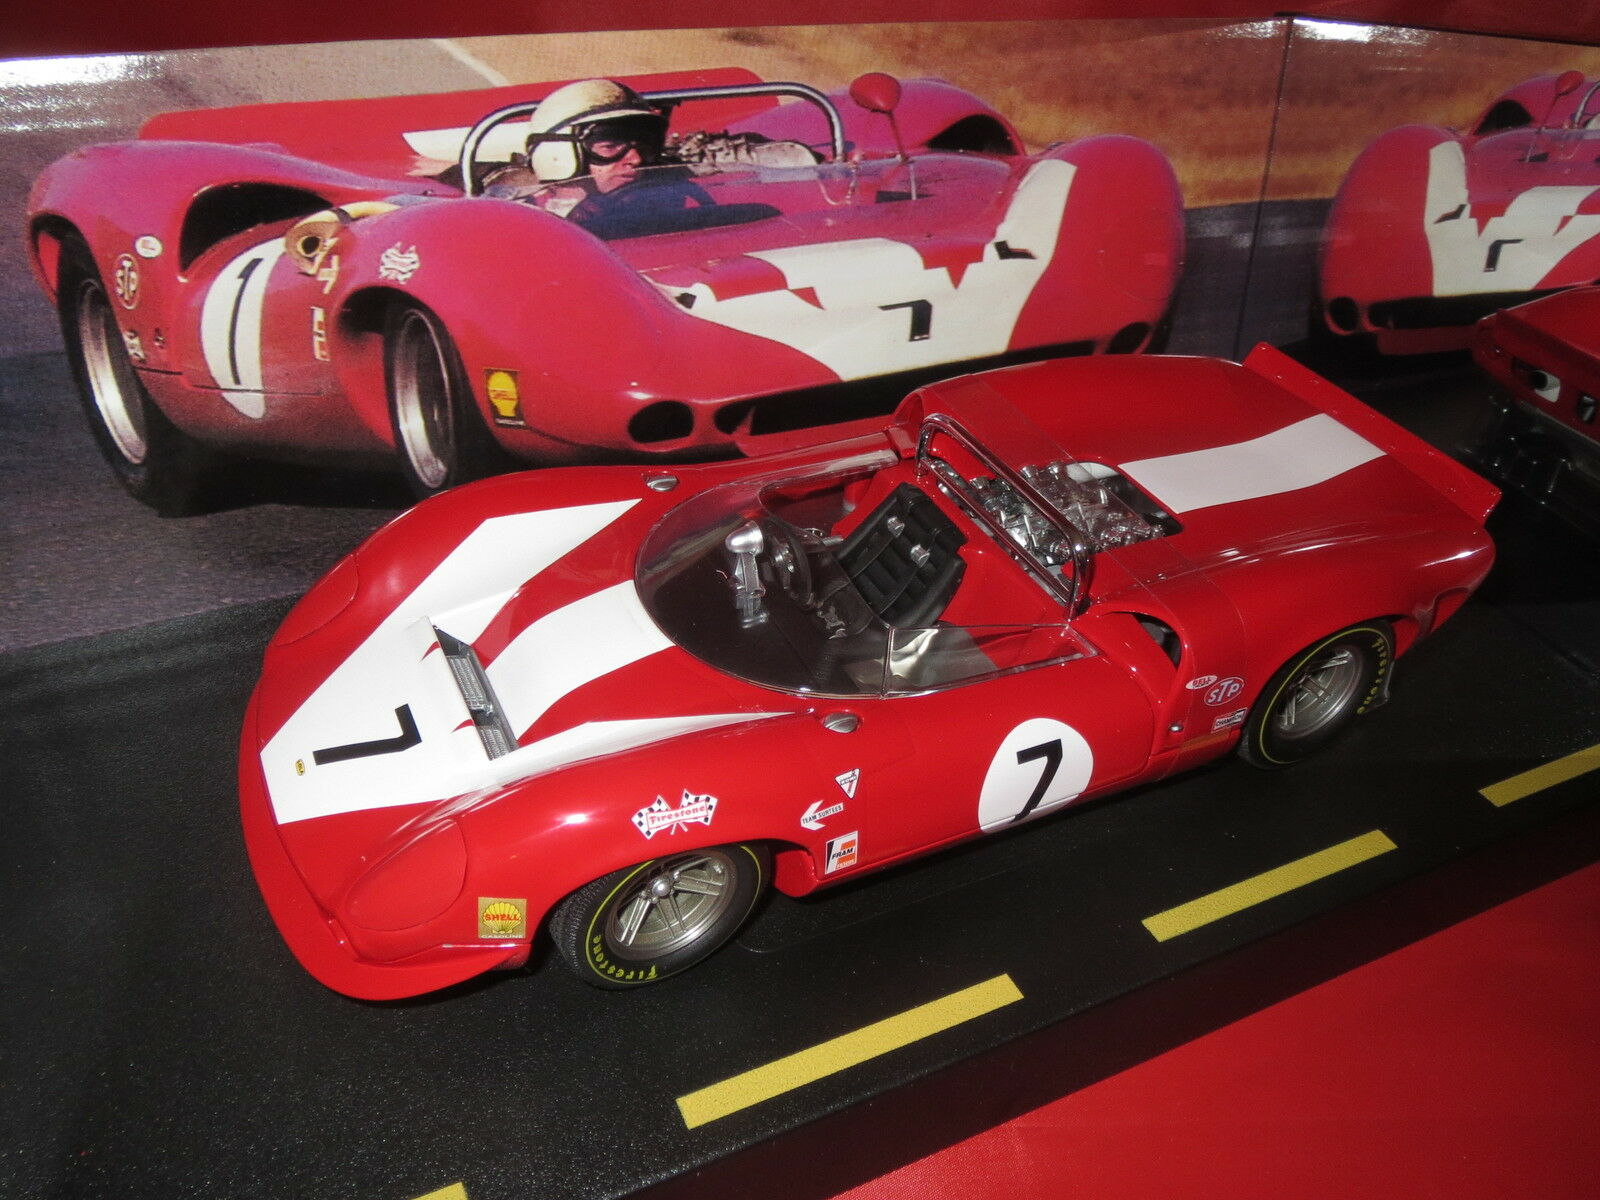 GMP 1967 John surtees  7 team surtees Lola spyder limousine Edition 1500 1 18 OVP